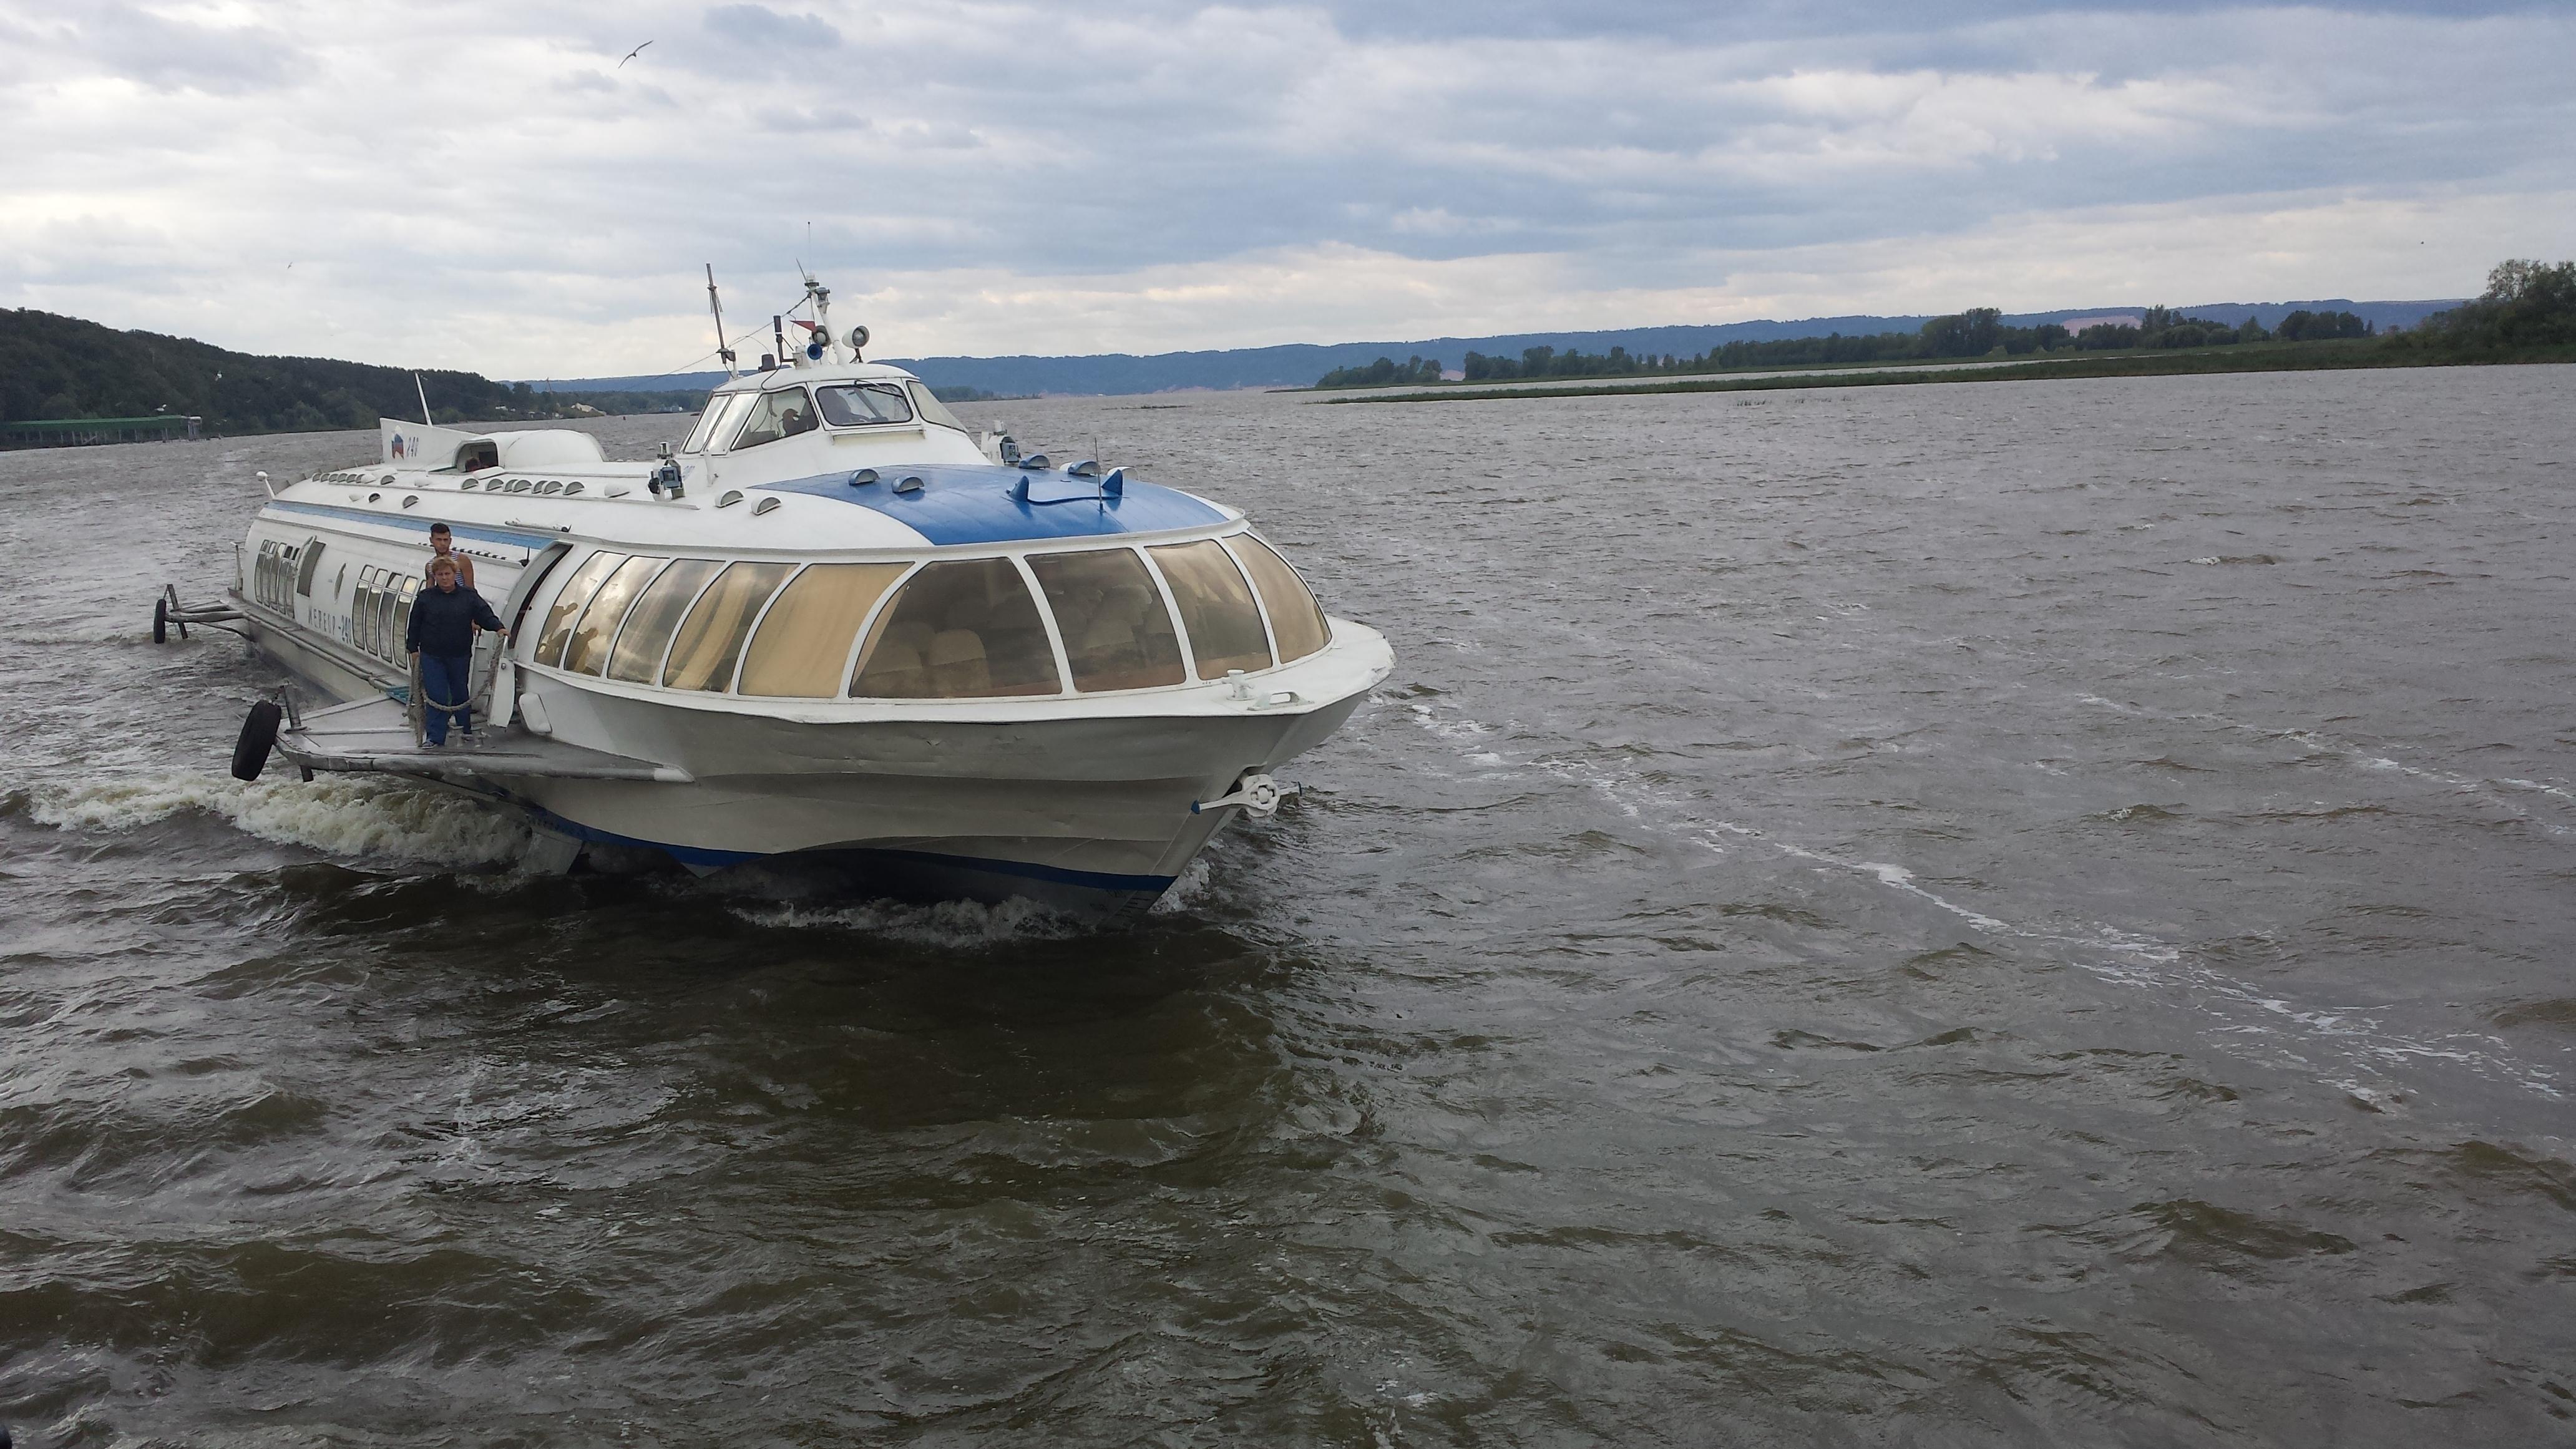 Hydrofoil Boat History 240 Hydrofoil Boat Jpg